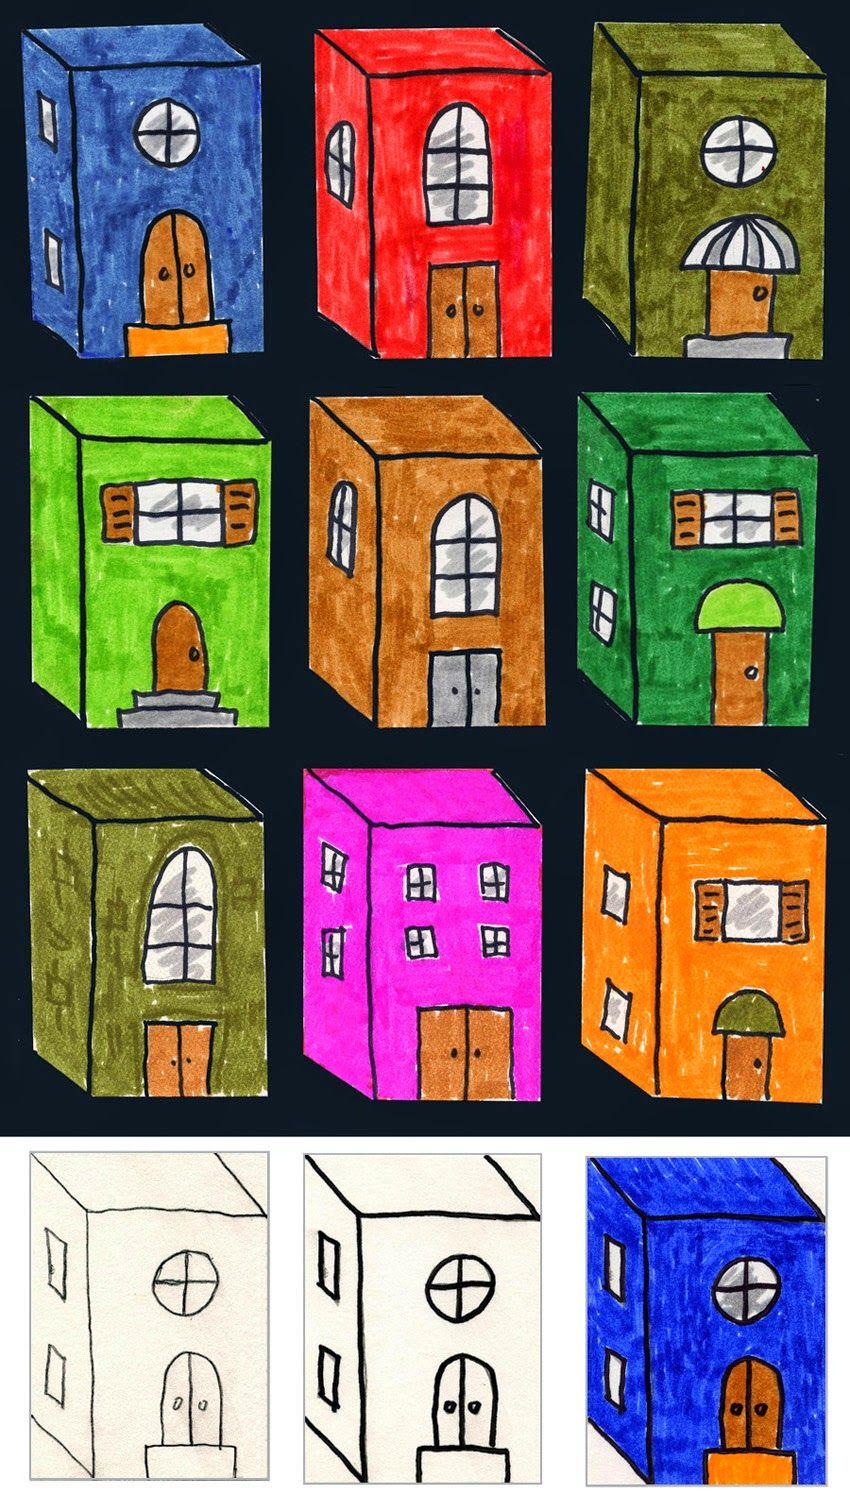 daffodil craft kunst grundschule pinterest 3d haus grundschulen und 3d. Black Bedroom Furniture Sets. Home Design Ideas